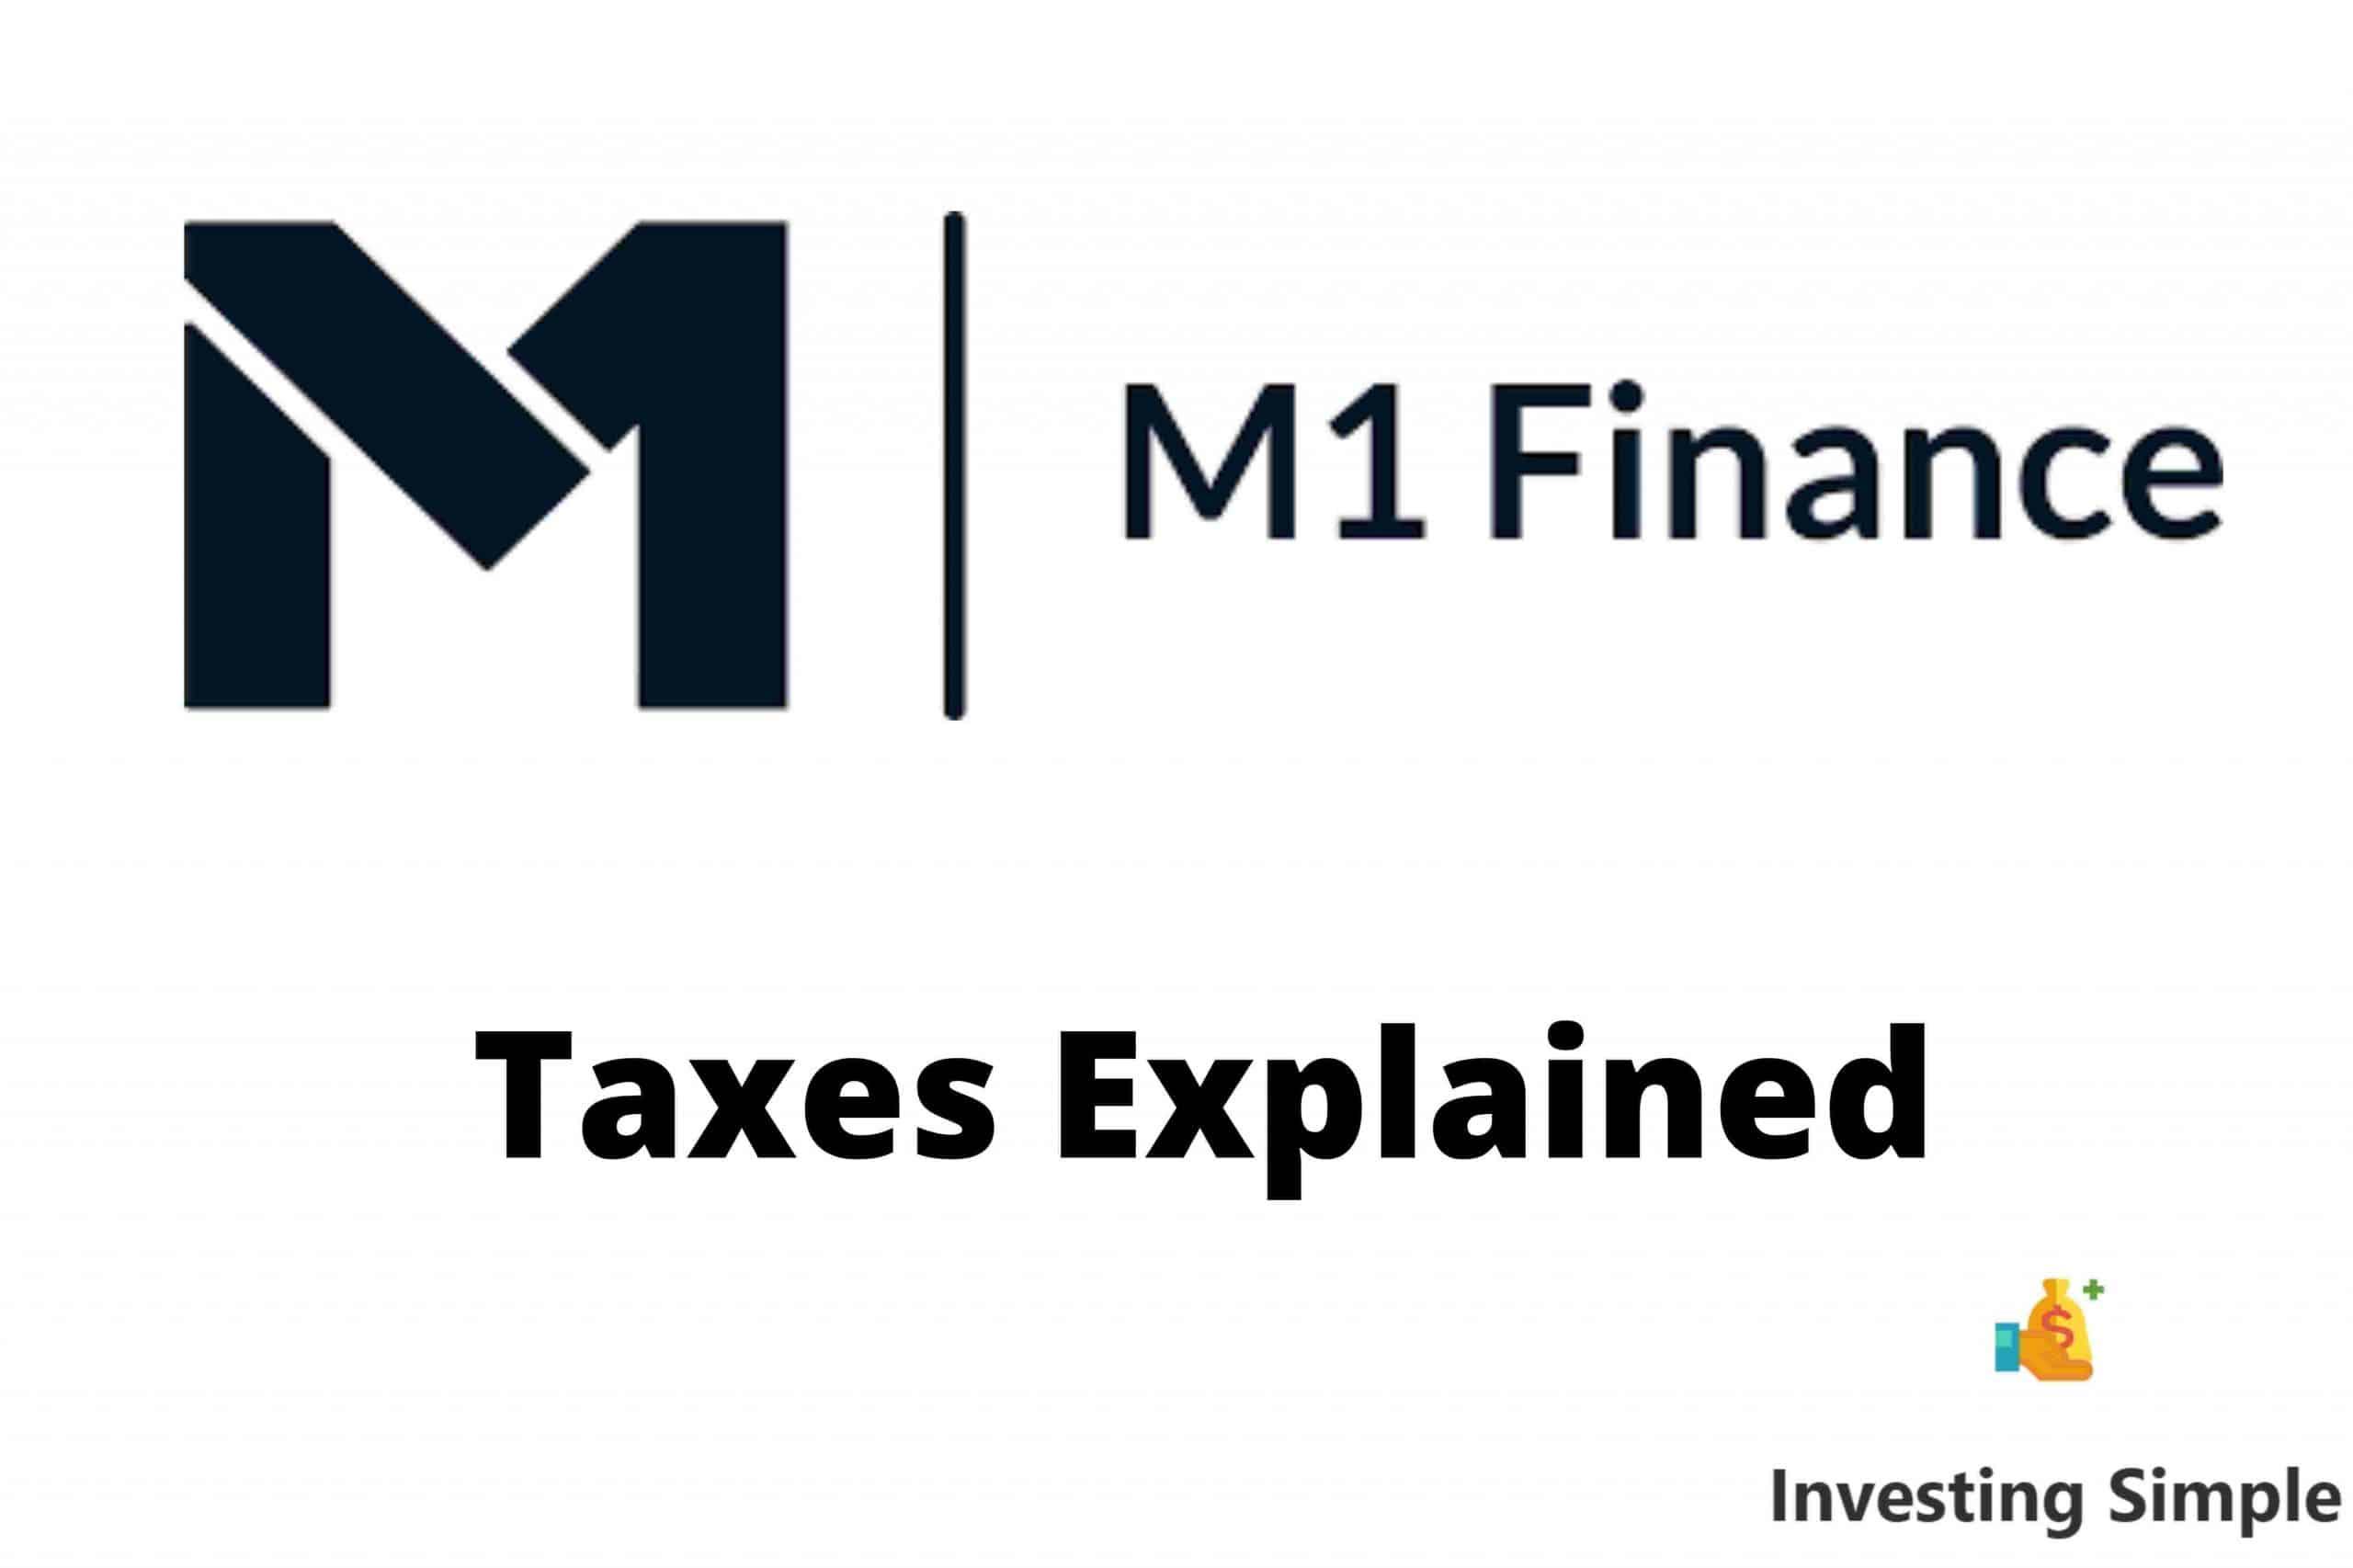 M1 Finance Taxes Explained